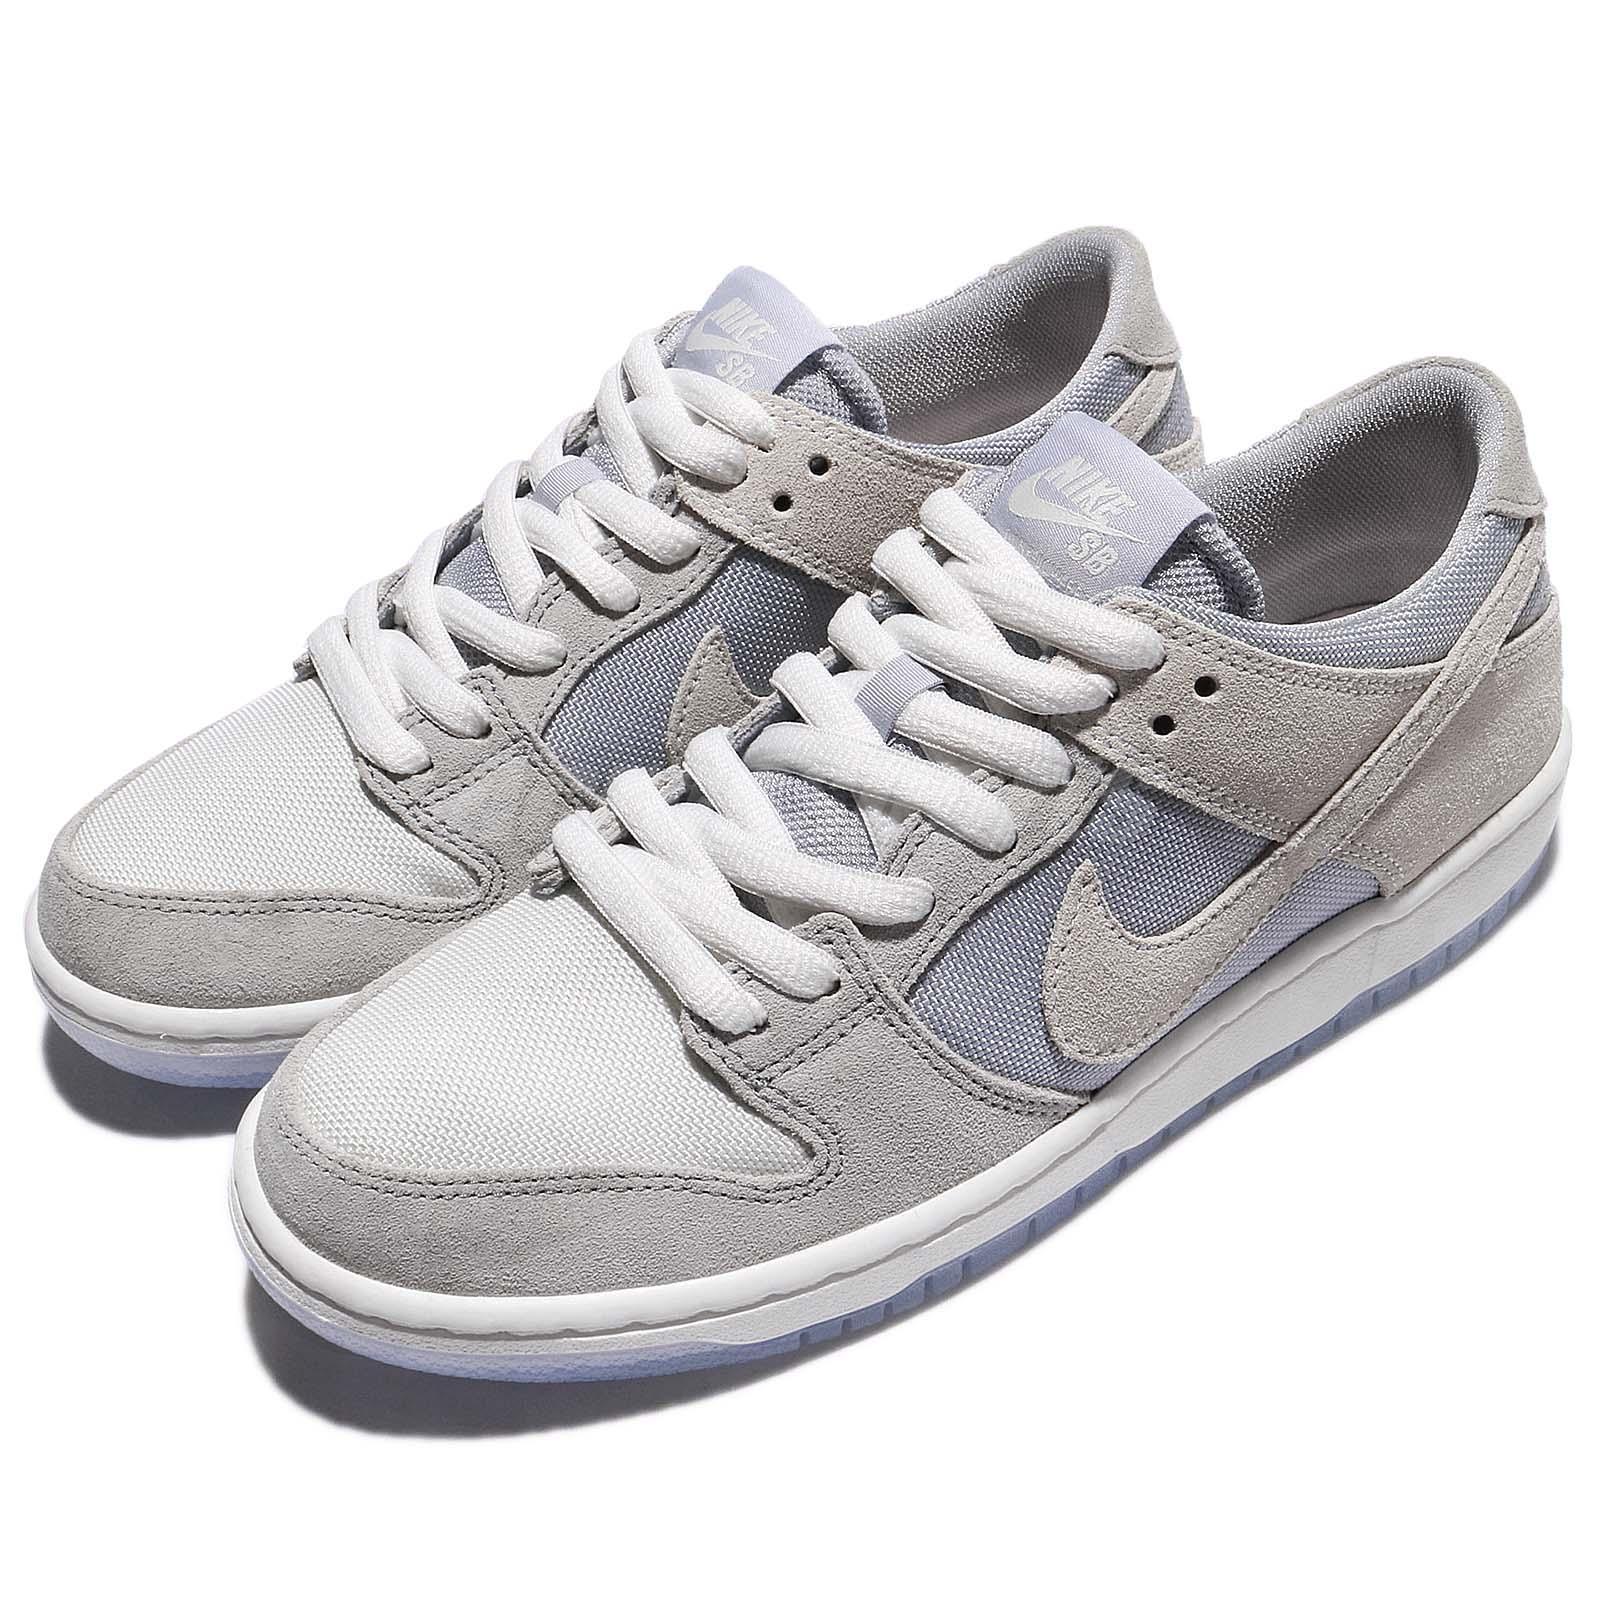 Nike Sb Dunk Low Pro Men S Skateboarding Shoe